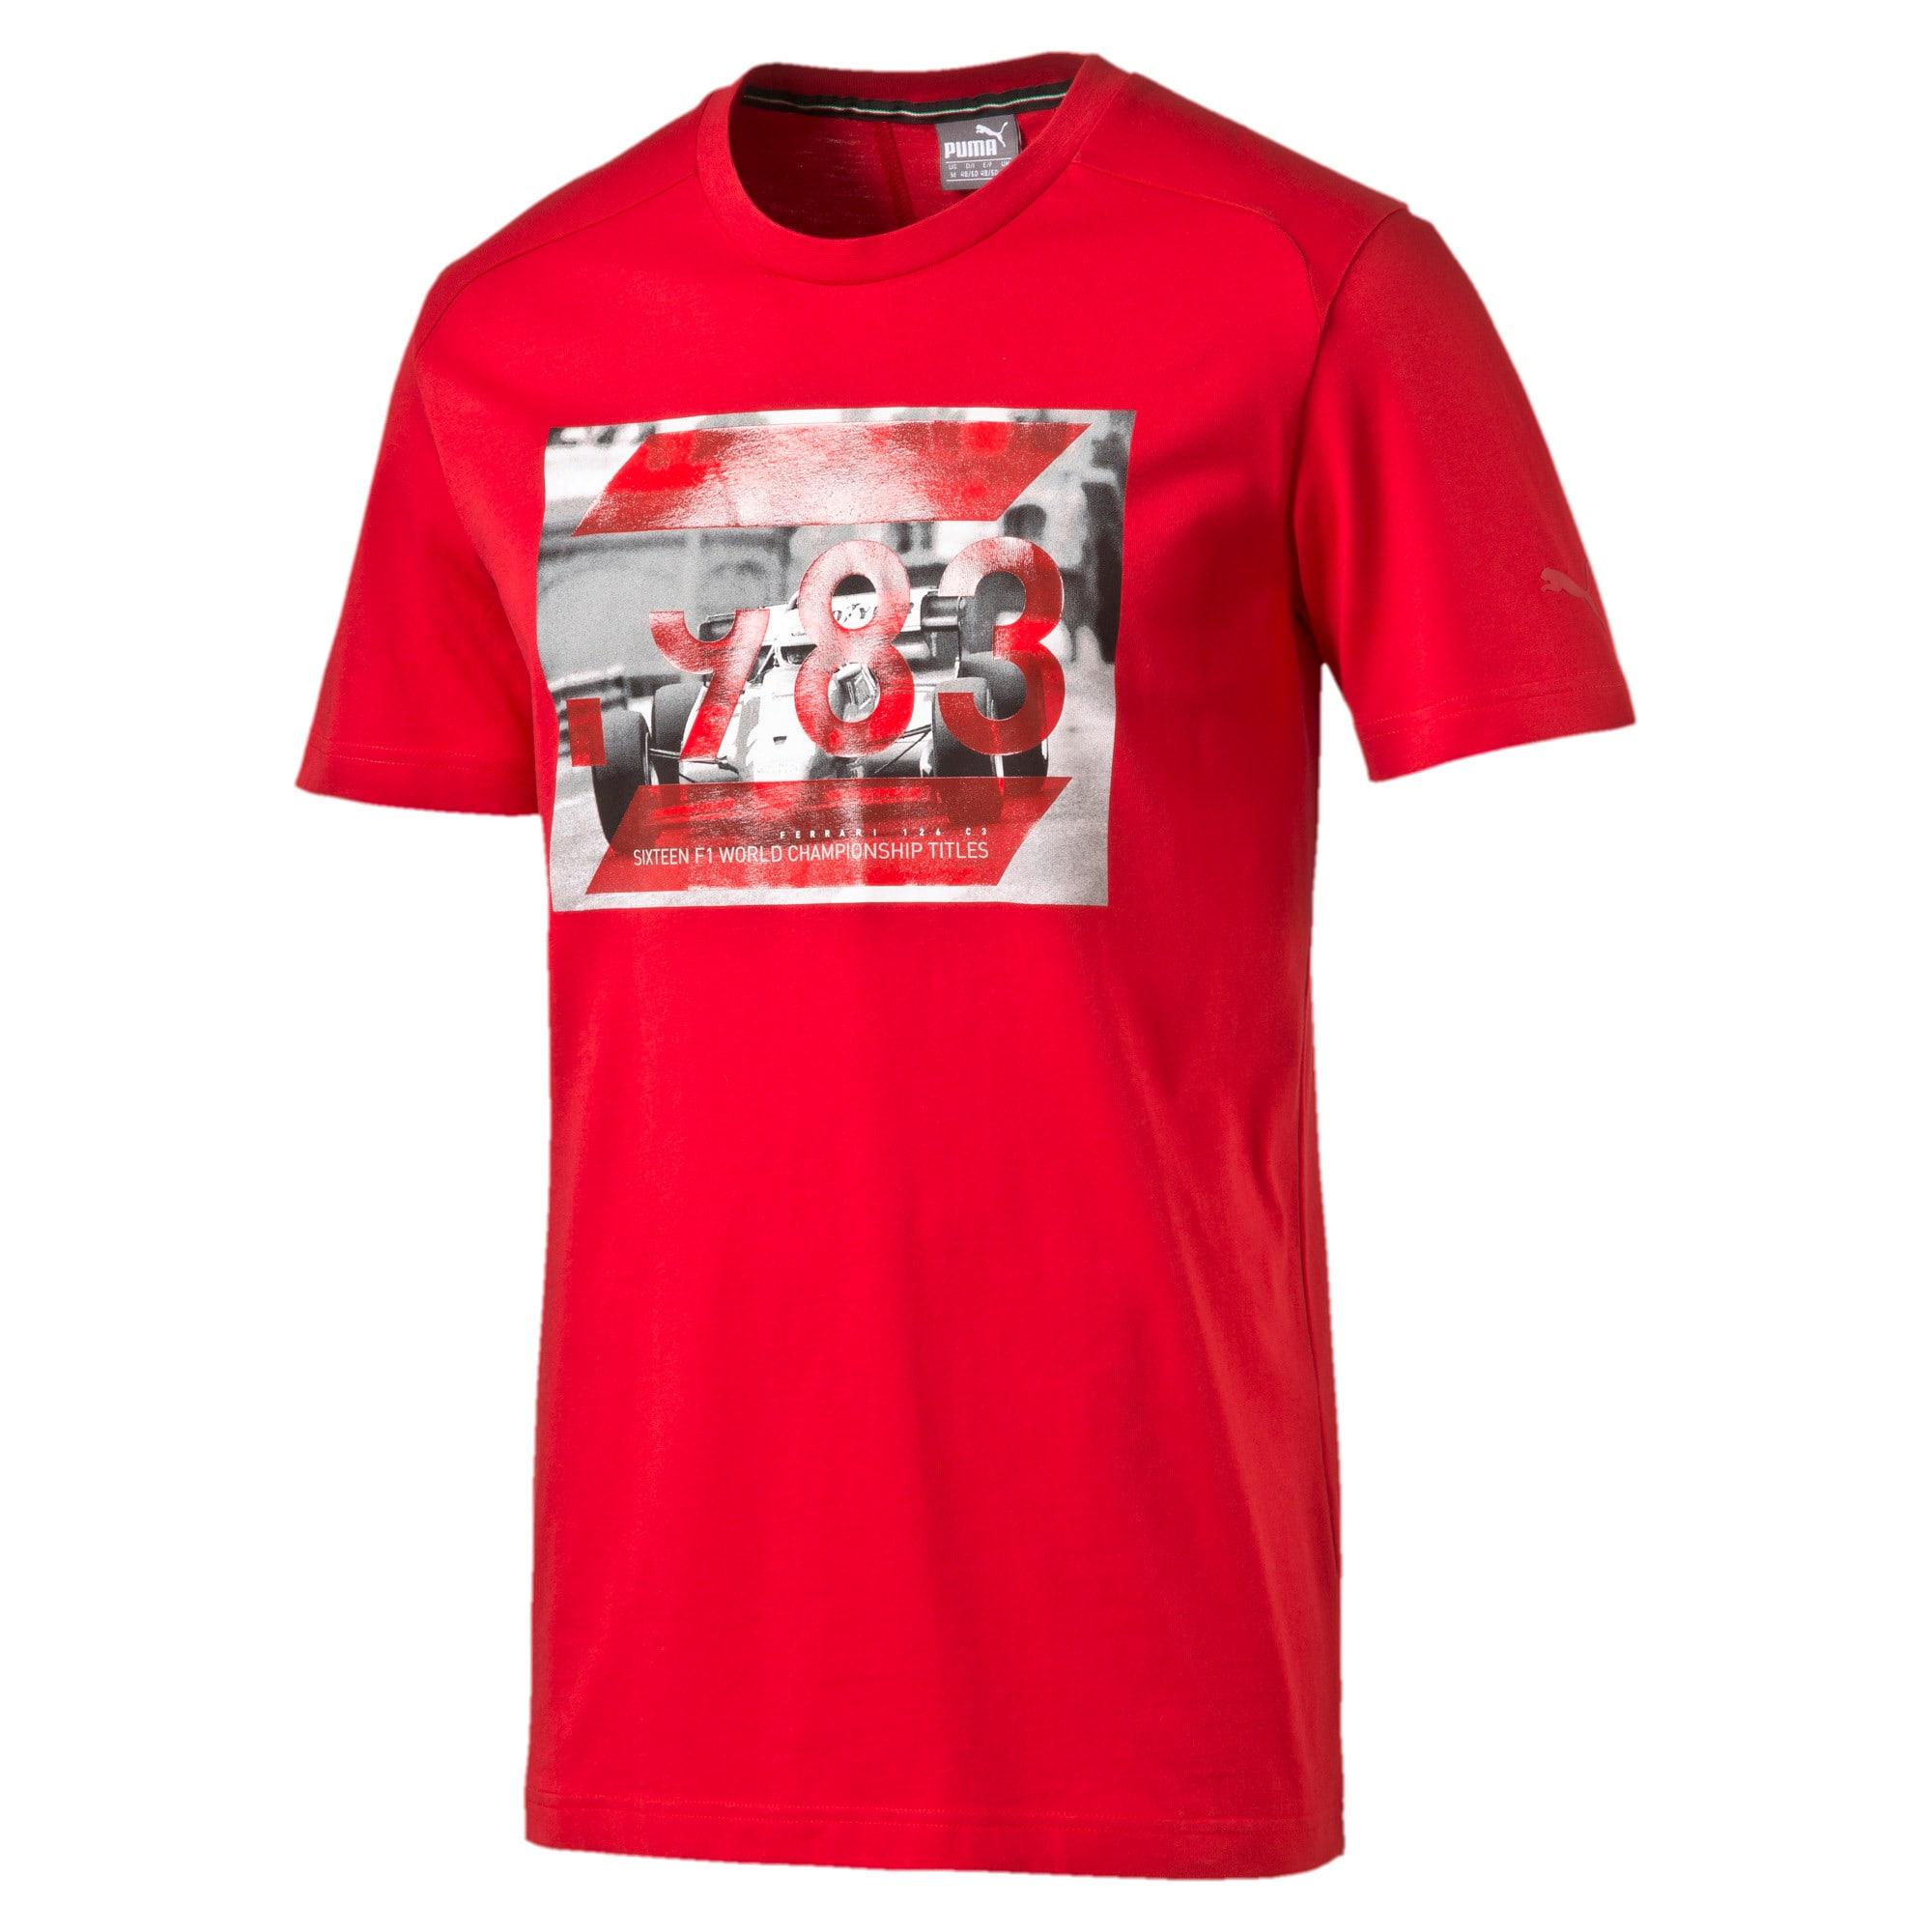 Thumbnail 4 of Ferrari Graphic T-Shirt, rosso corsa, medium-IND